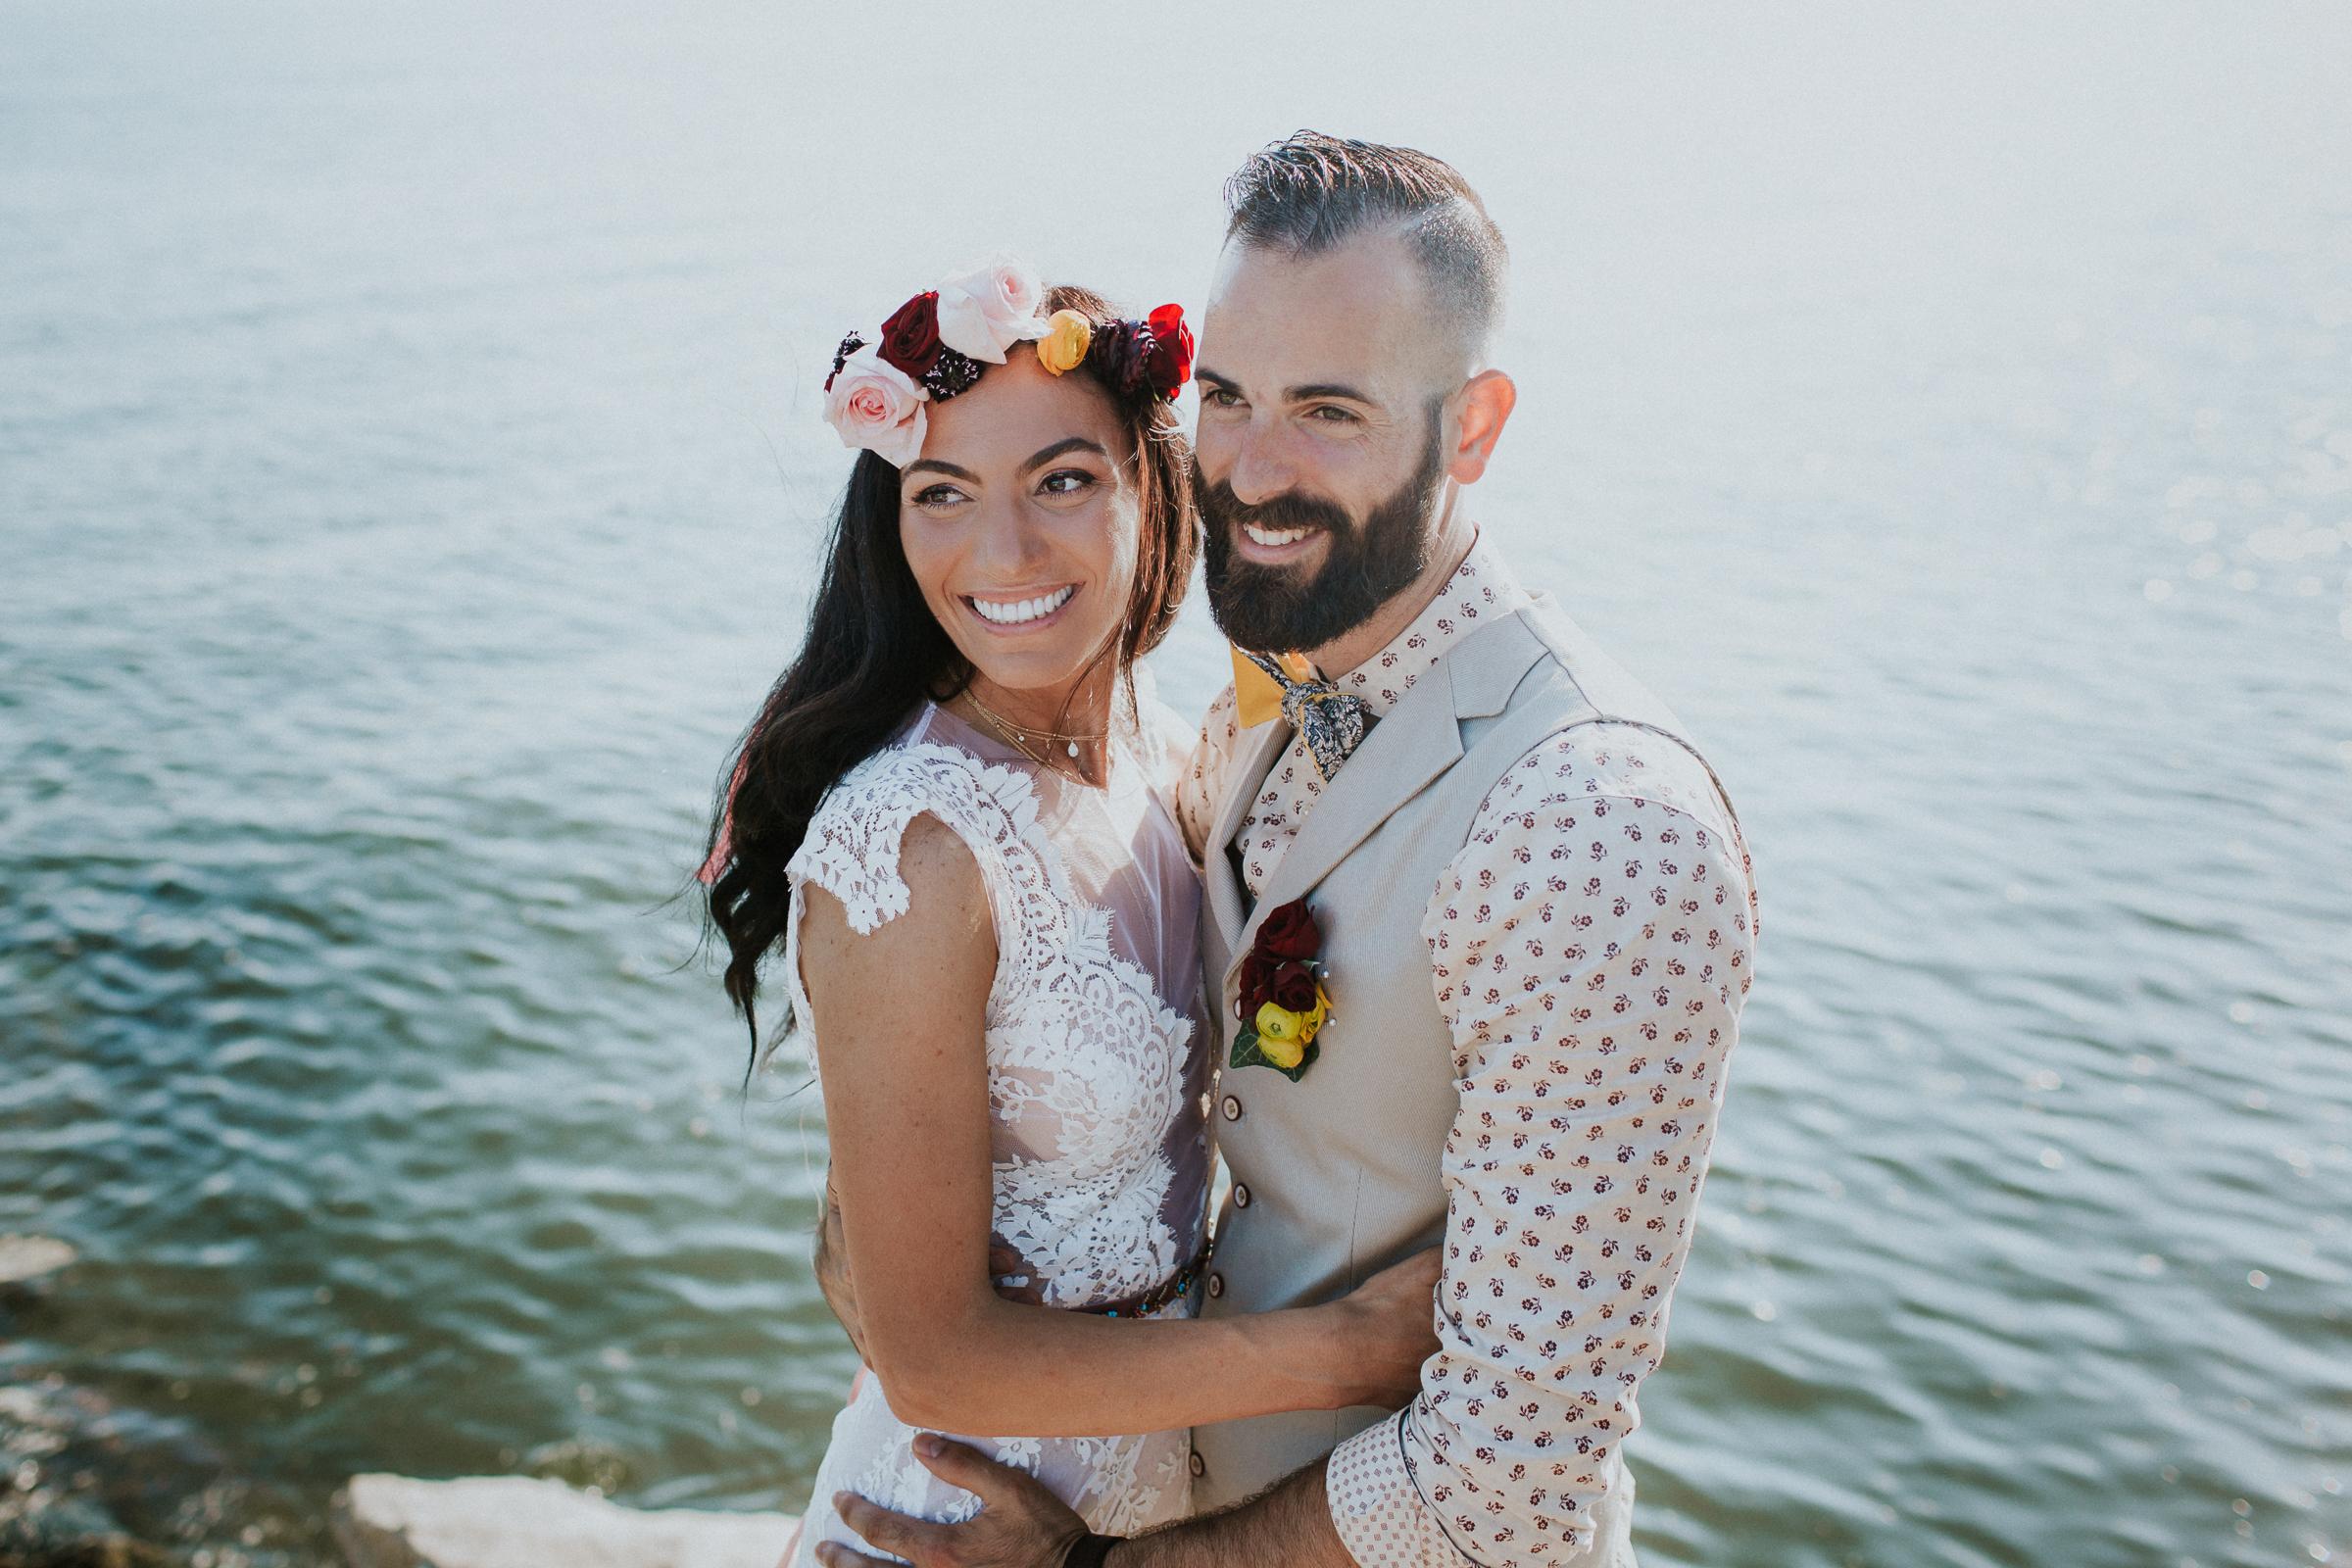 Backyard-Intimate-Adventurous-Destination-Wedding-Darien-Connecticut-Documentary-Wedding-Photography-87.jpg